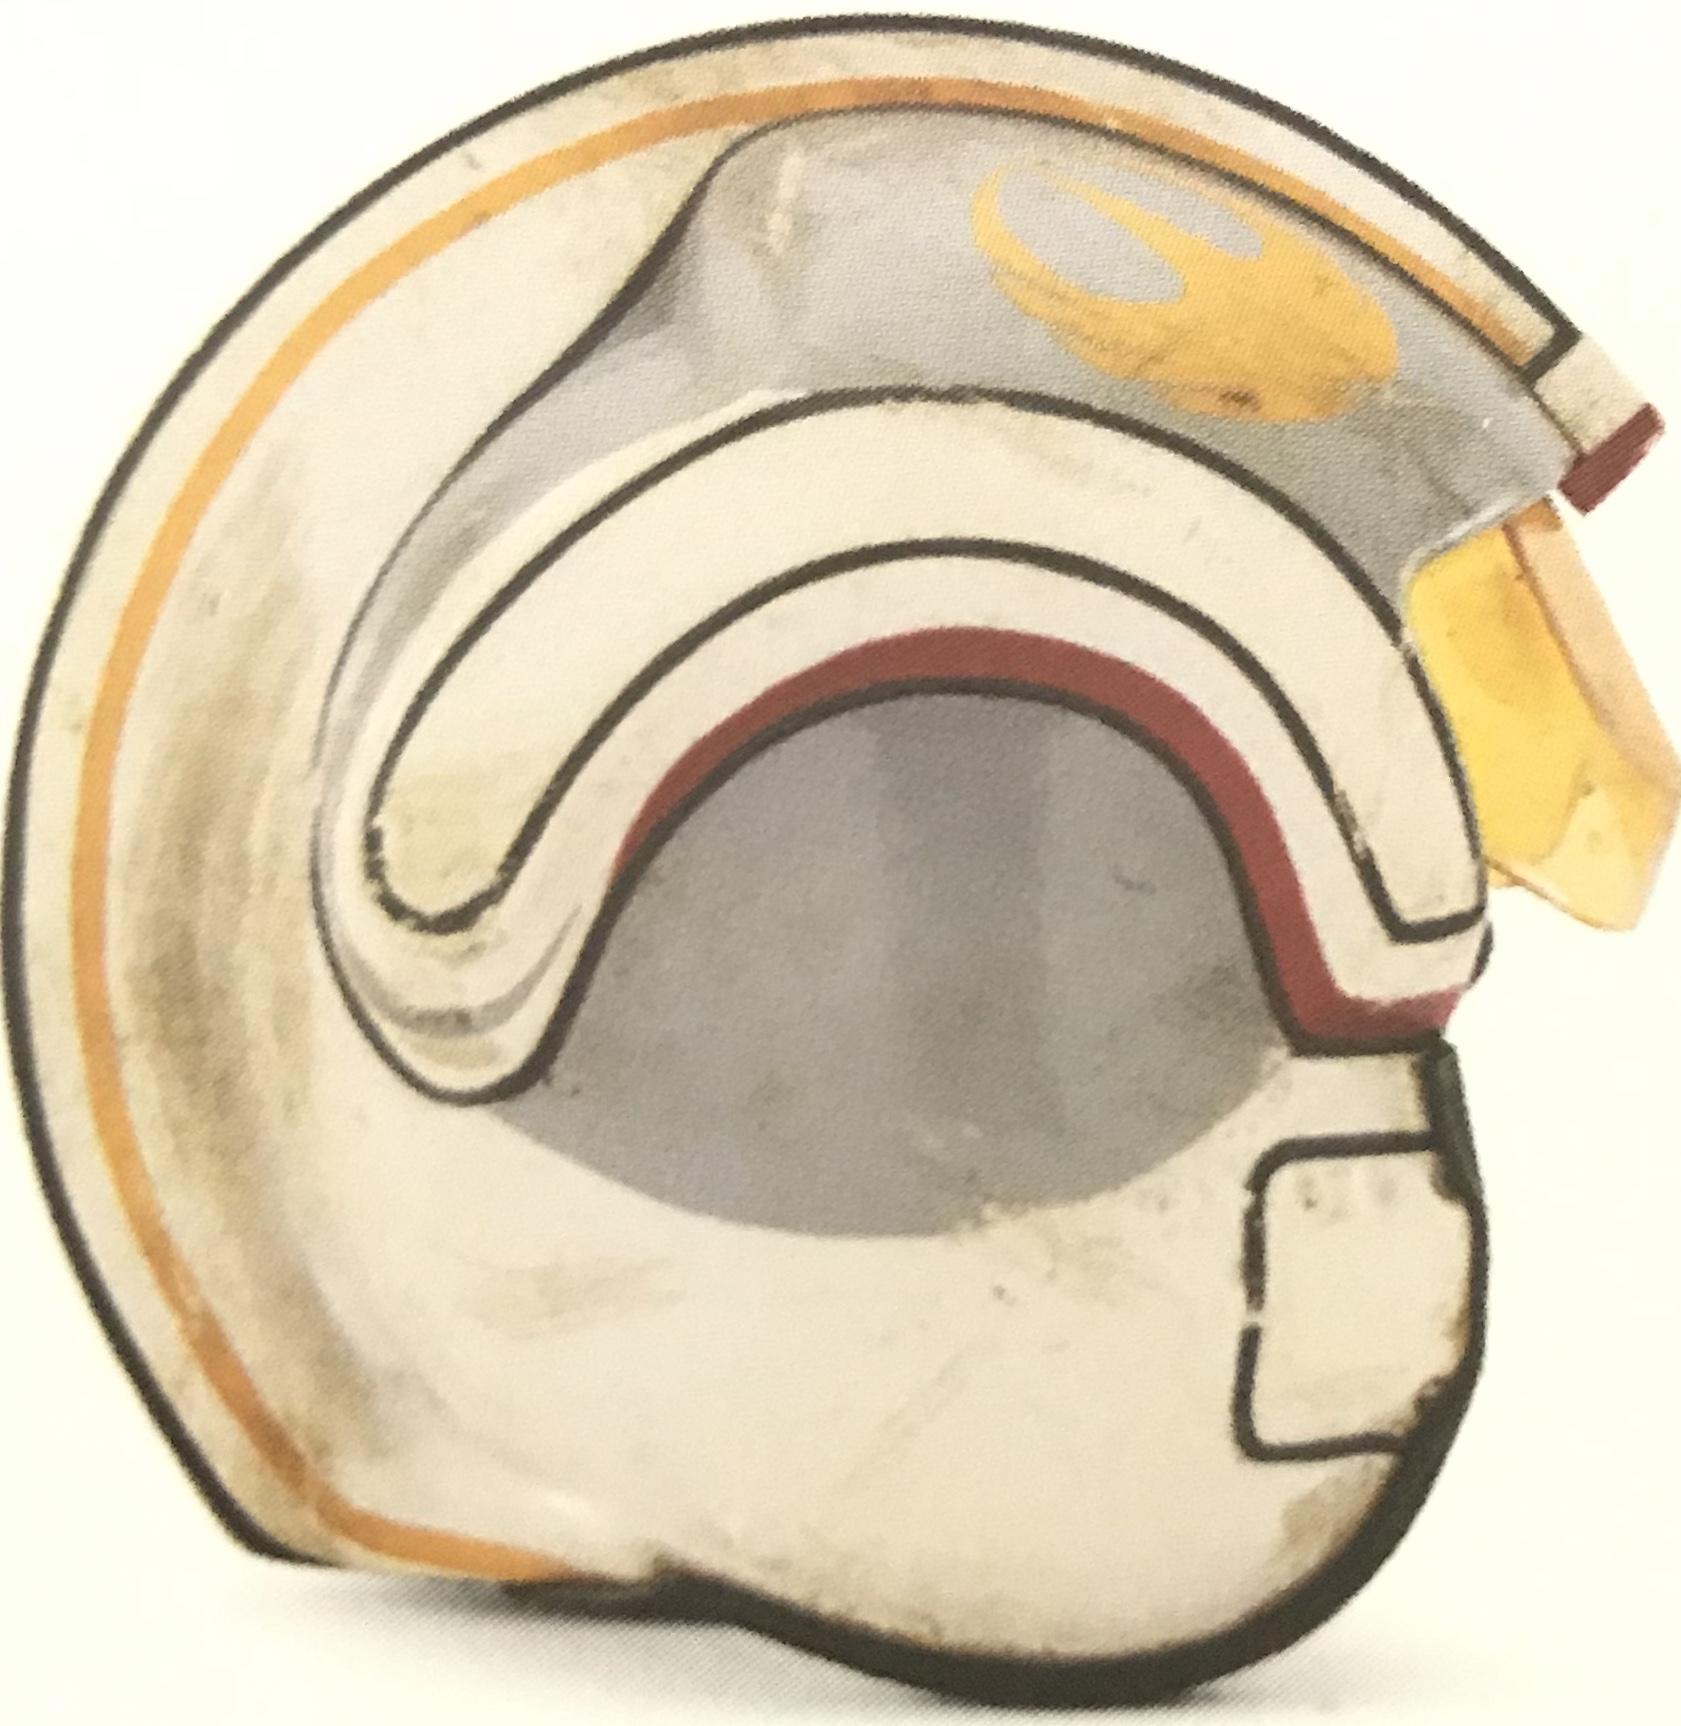 Marko helmet